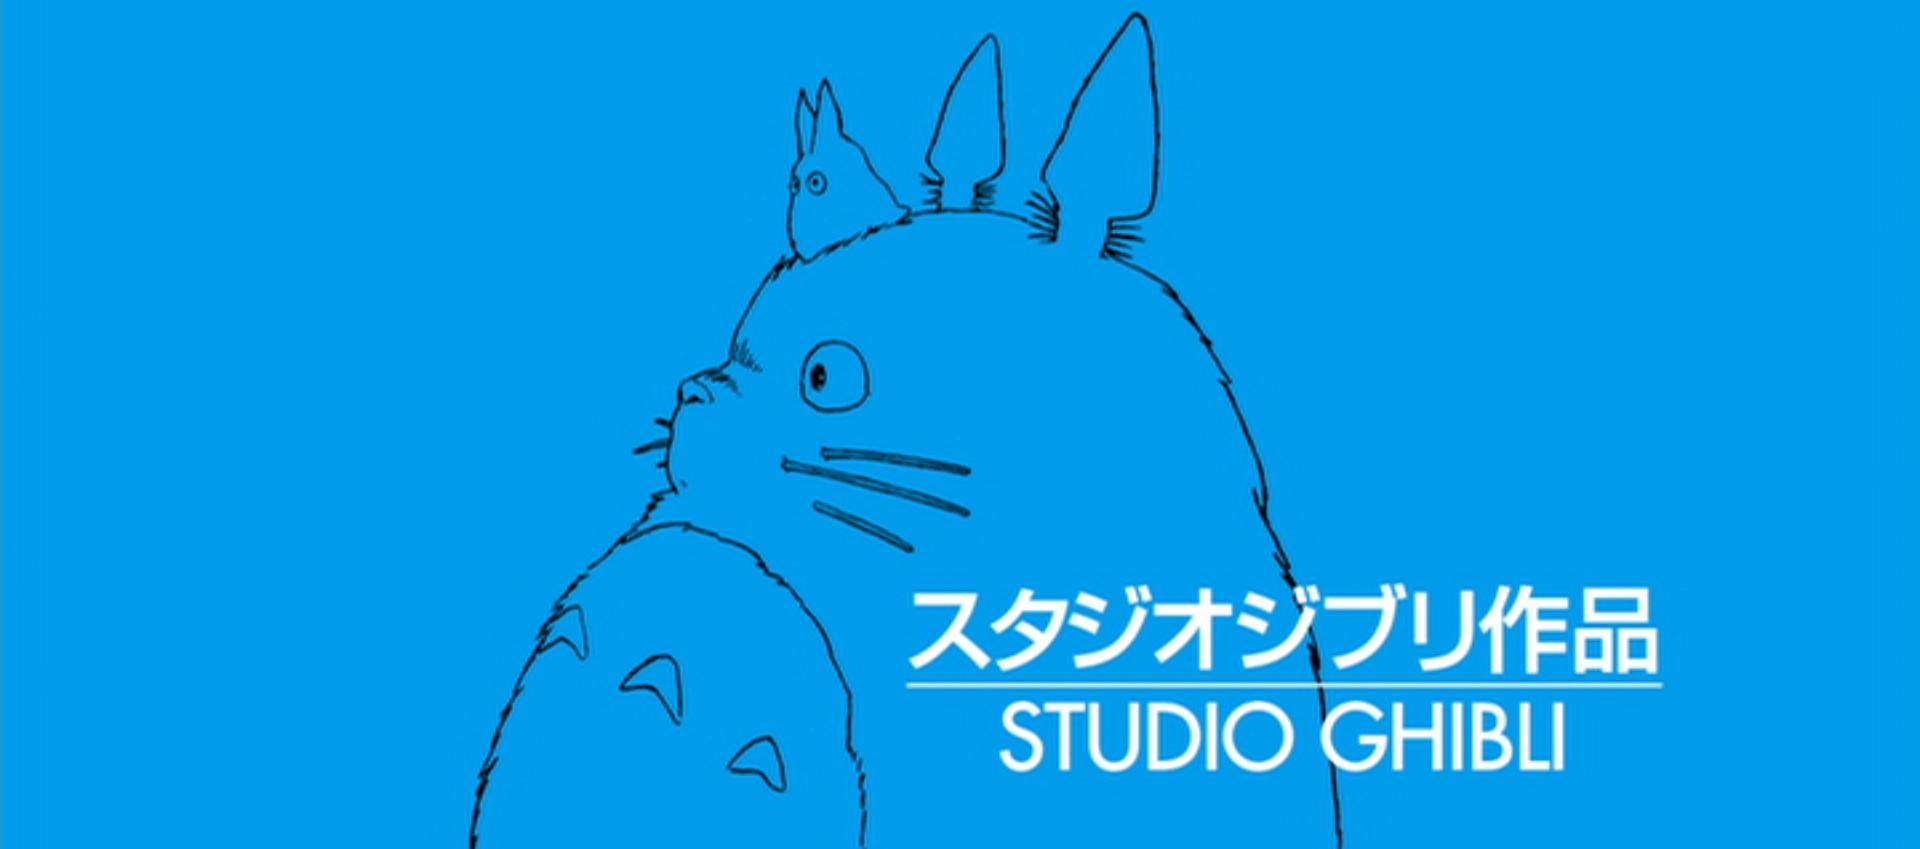 Studio Ghibli Logo. Image Credit: Studio Ghibli.